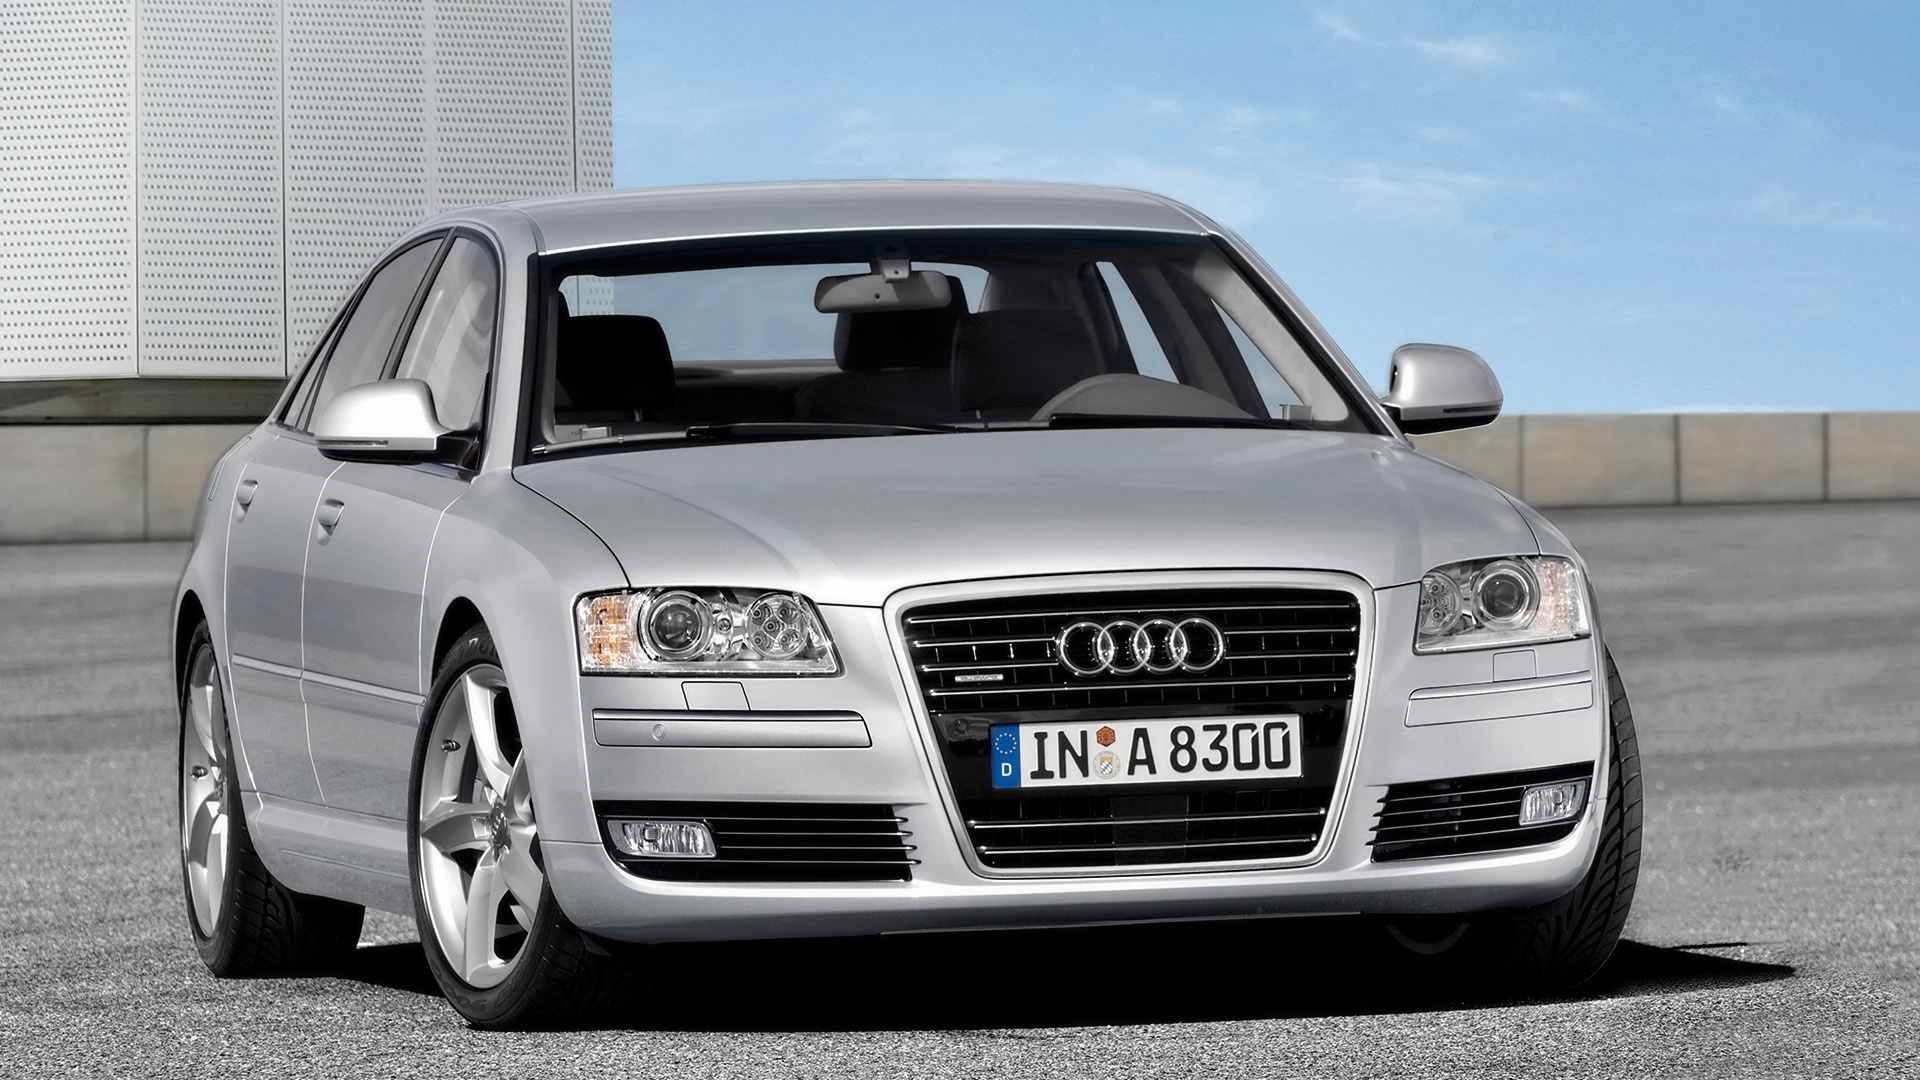 Audi A8 Quattro 2008 - High Definition Wallpapers - HD ...